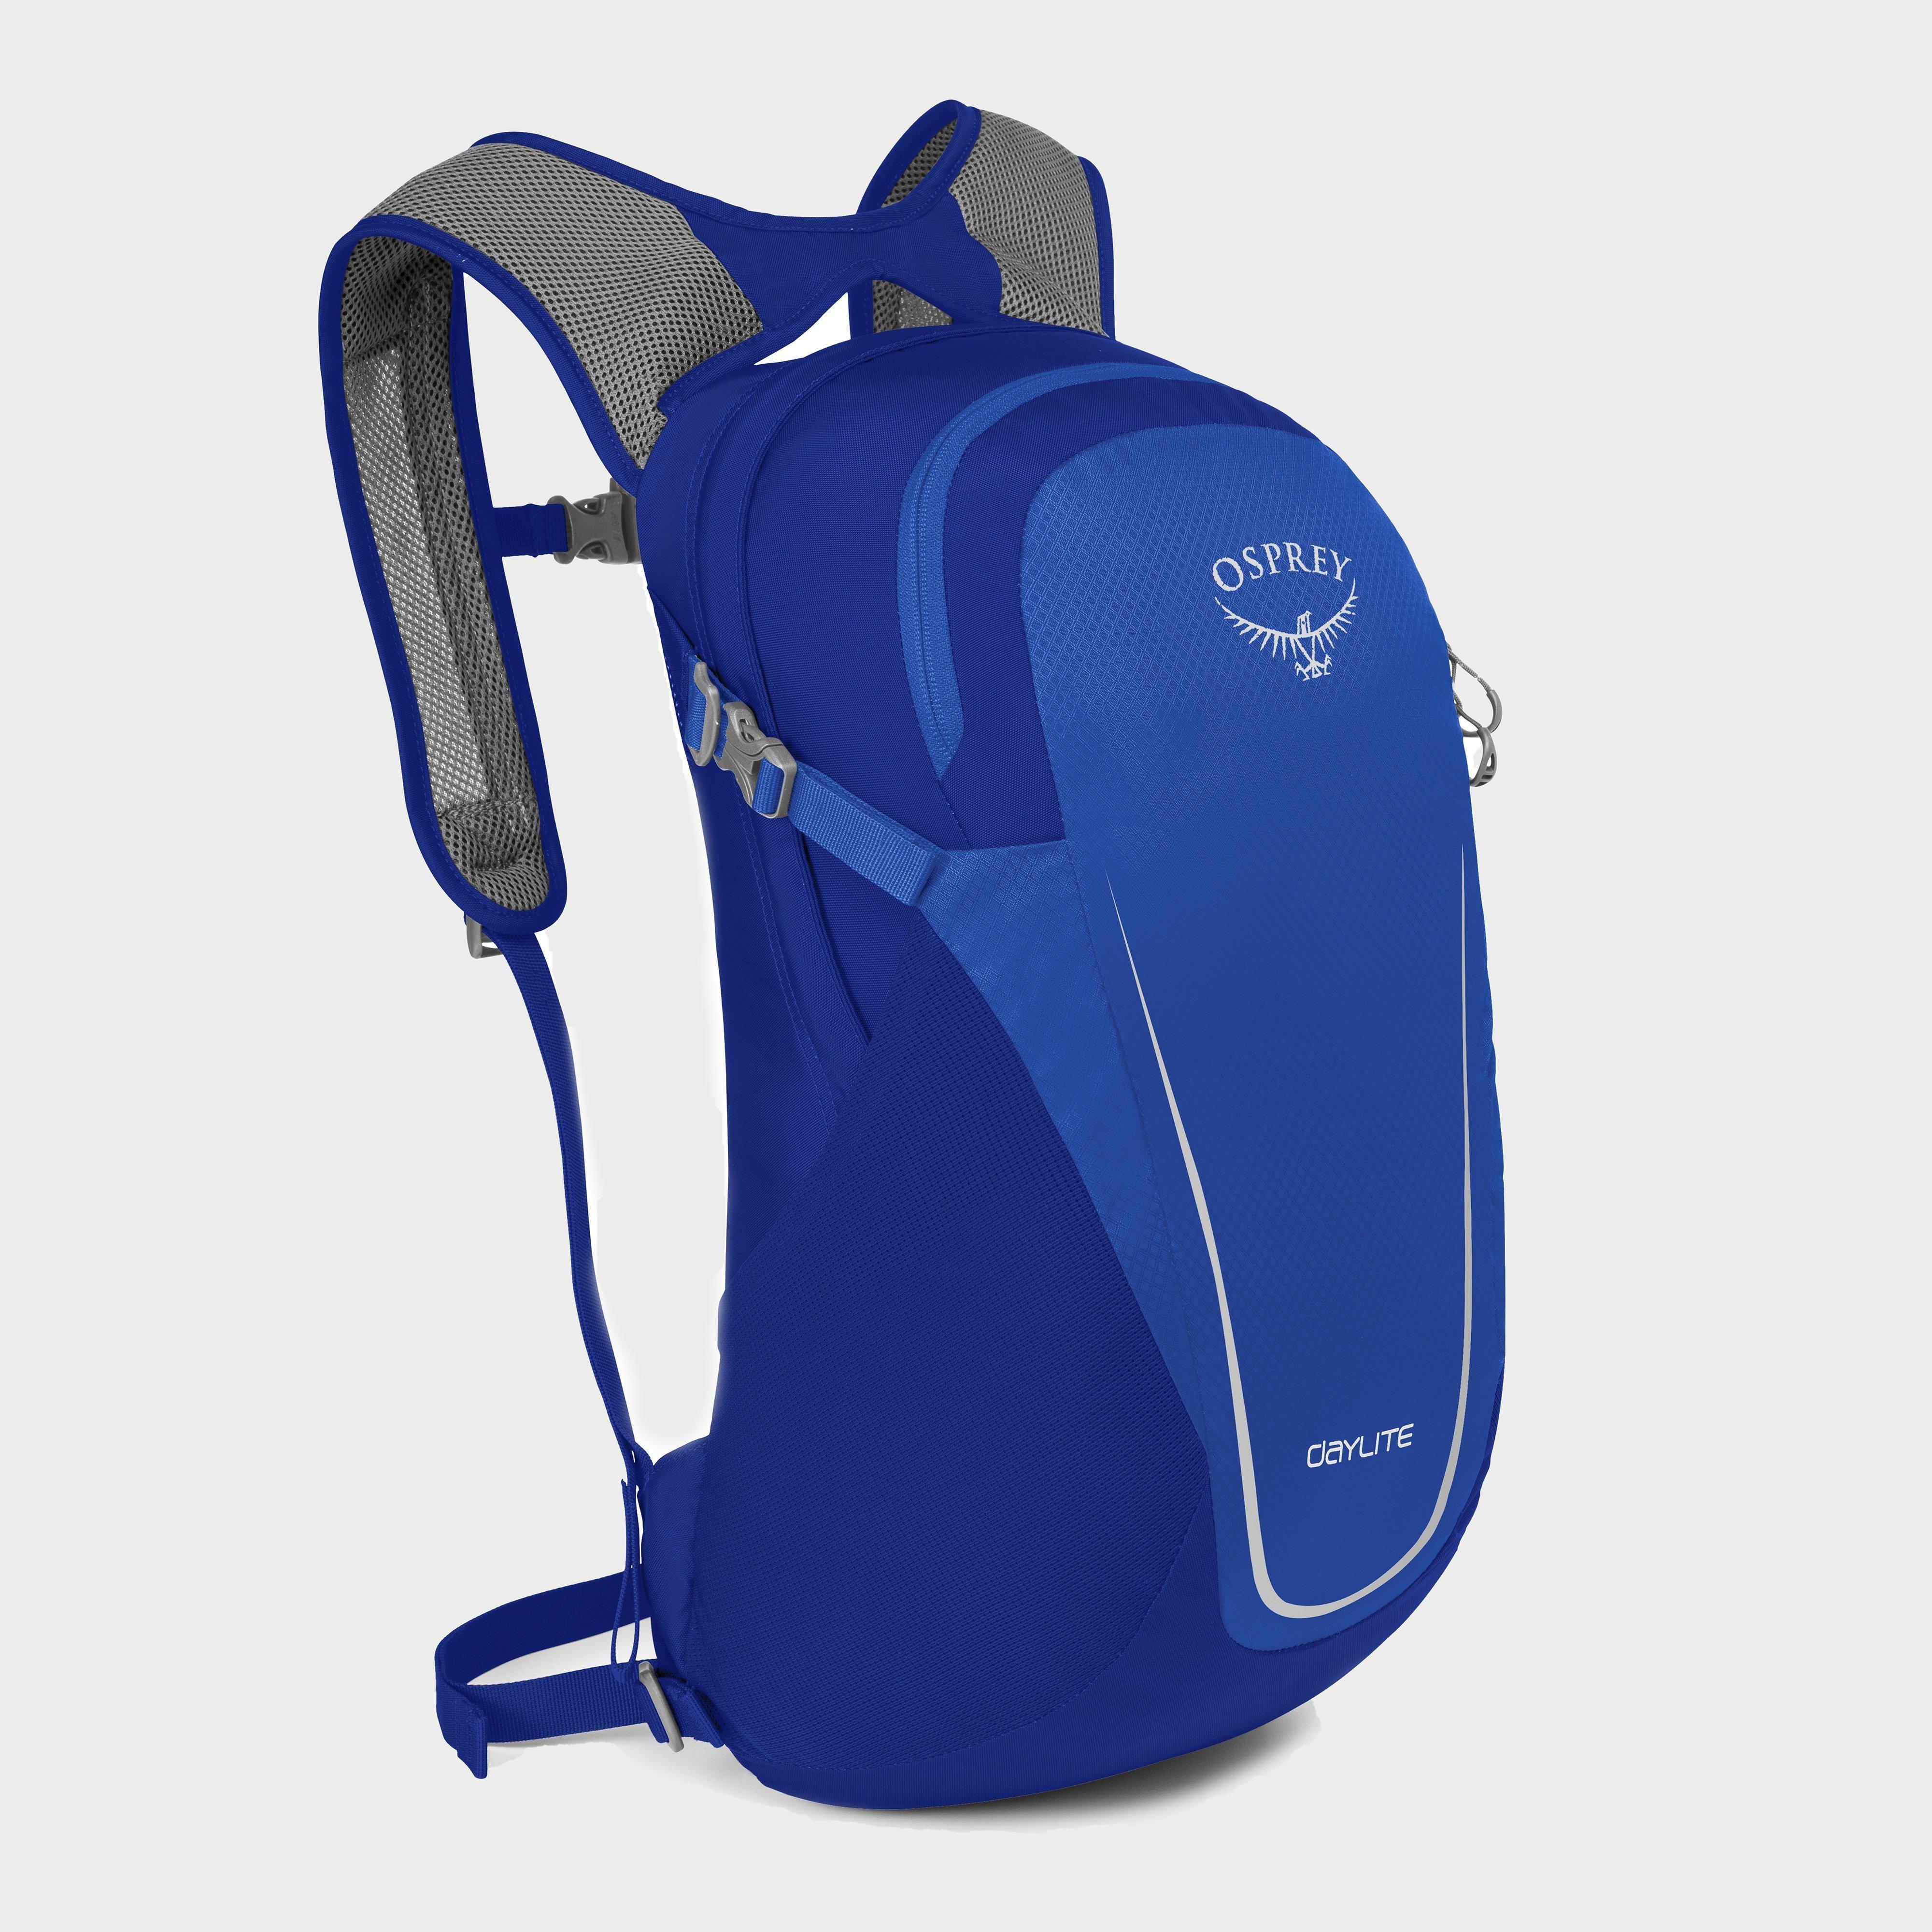 Osprey Daylite Daypack, Blue